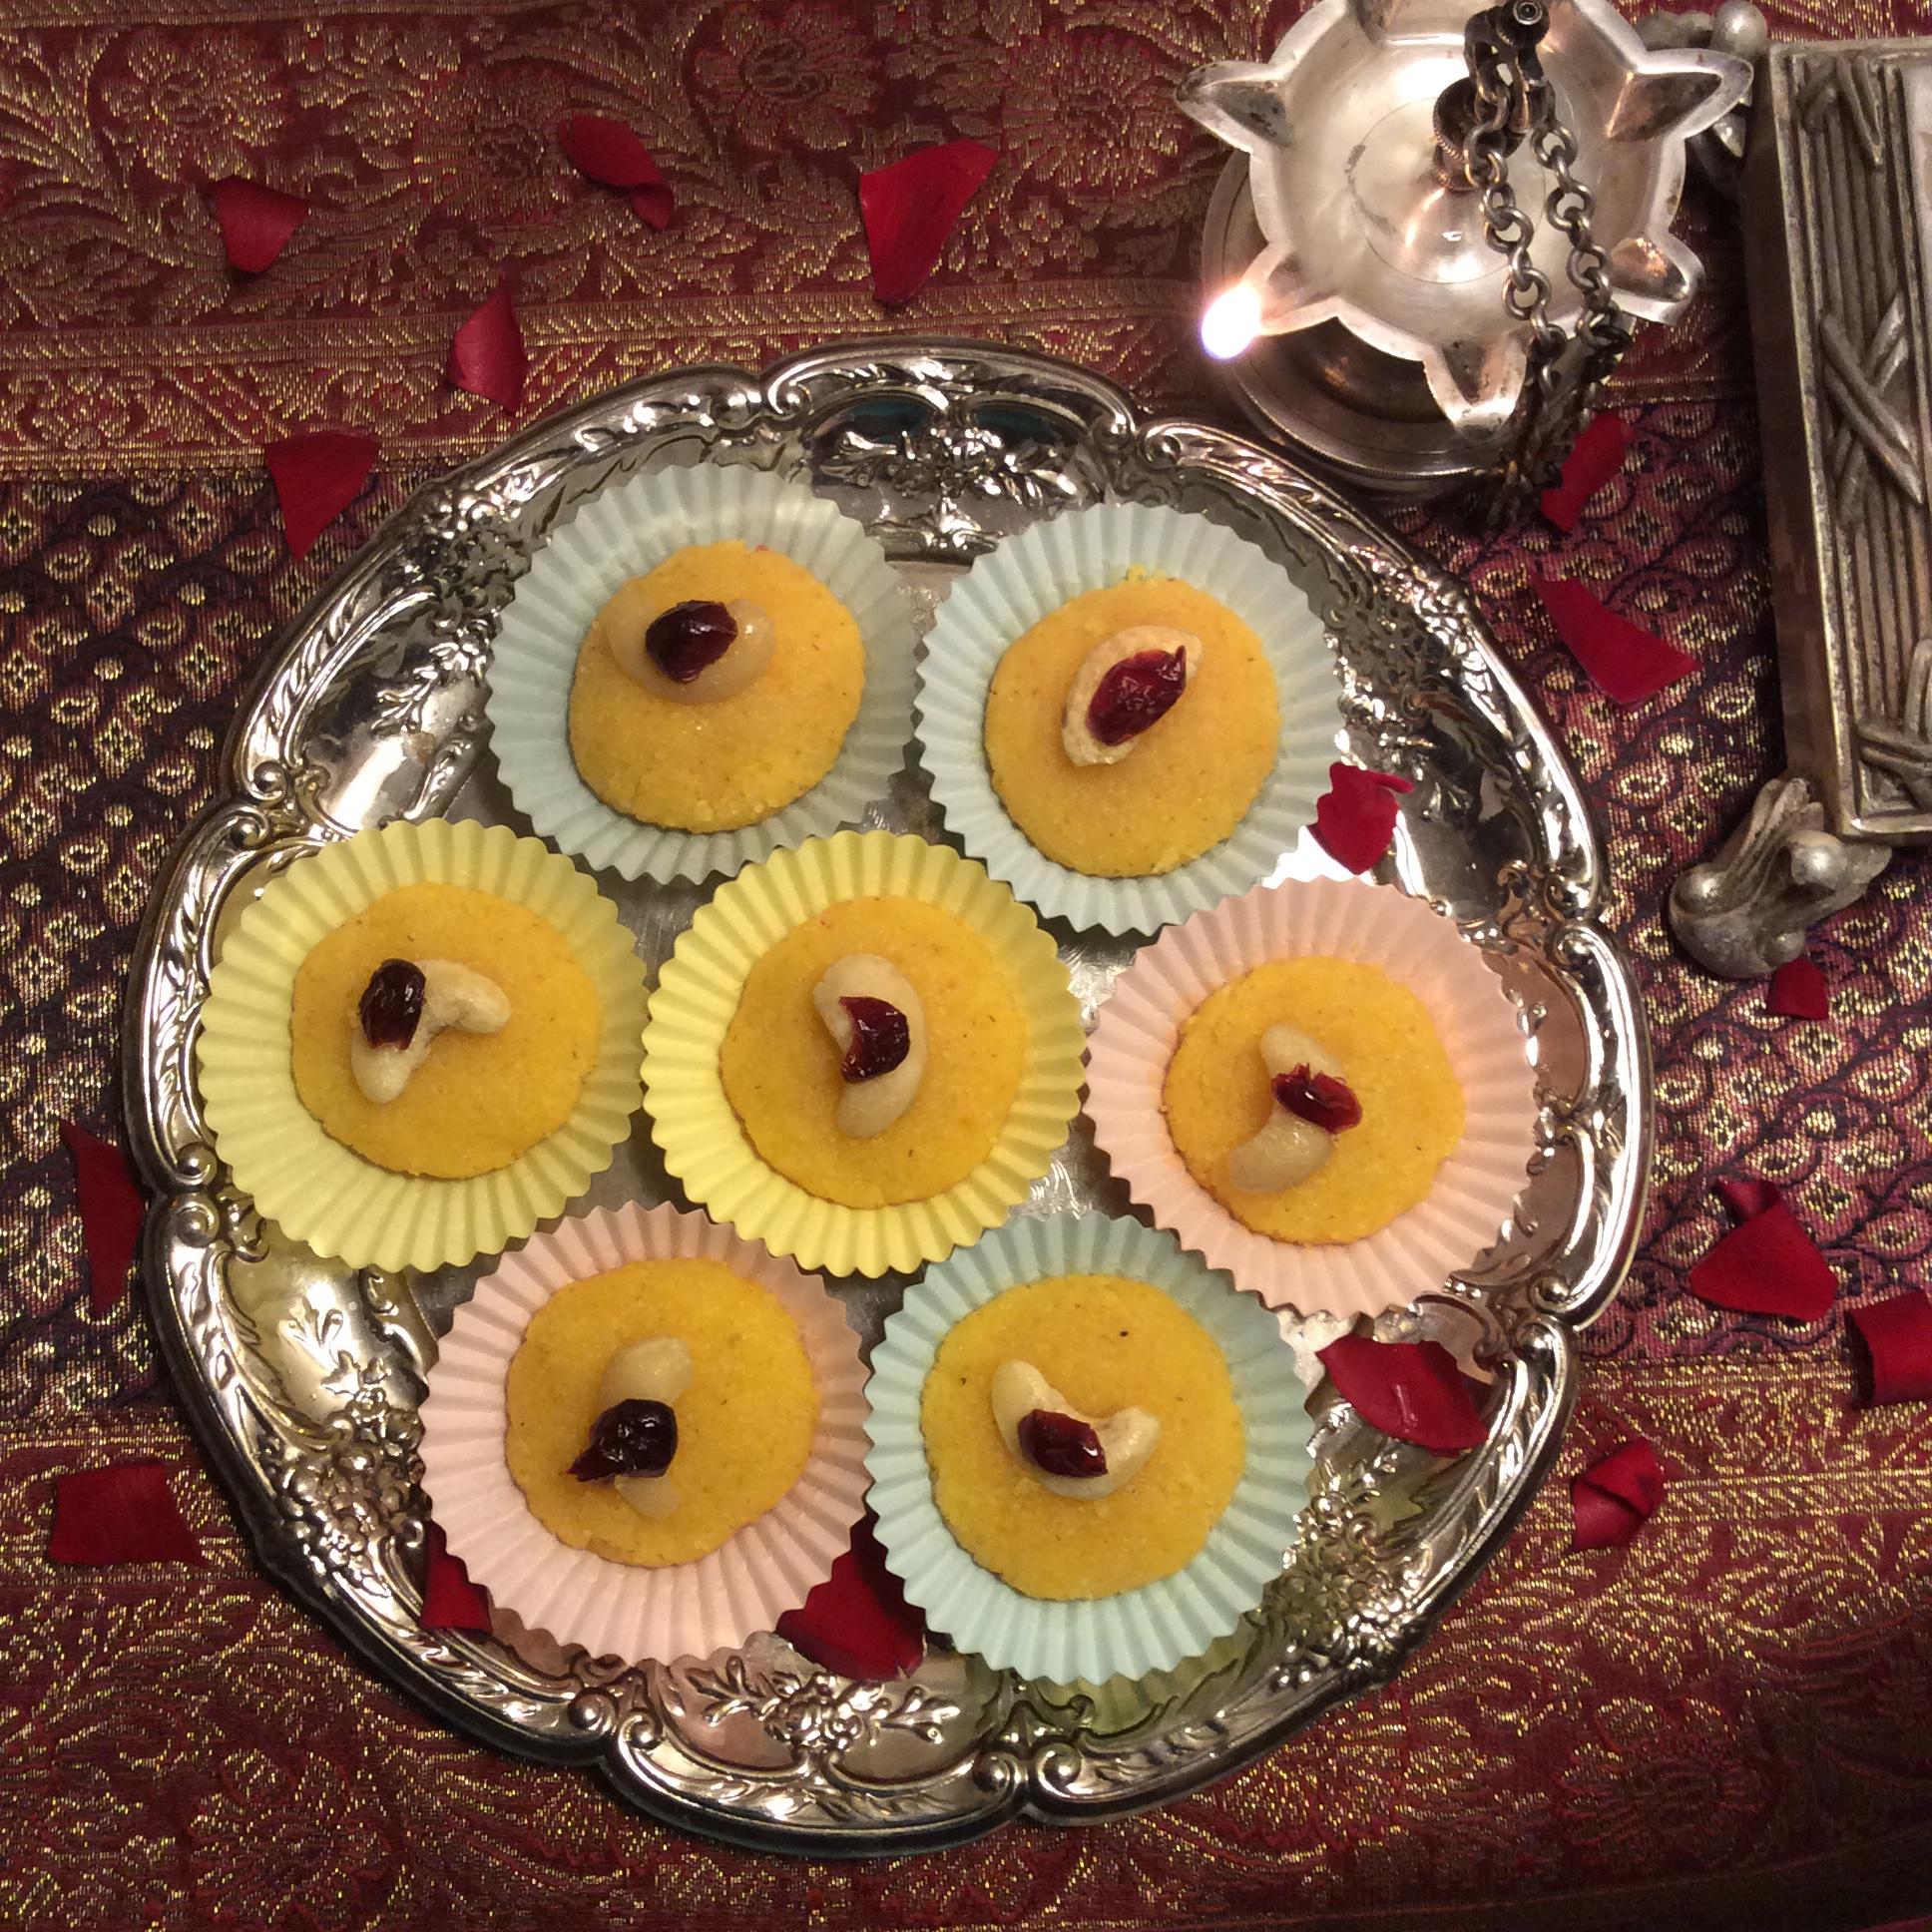 Saffron-mango halwa. © Copyright, November 2015, Sangeeta Pradhan, RD, LDN, CDE.